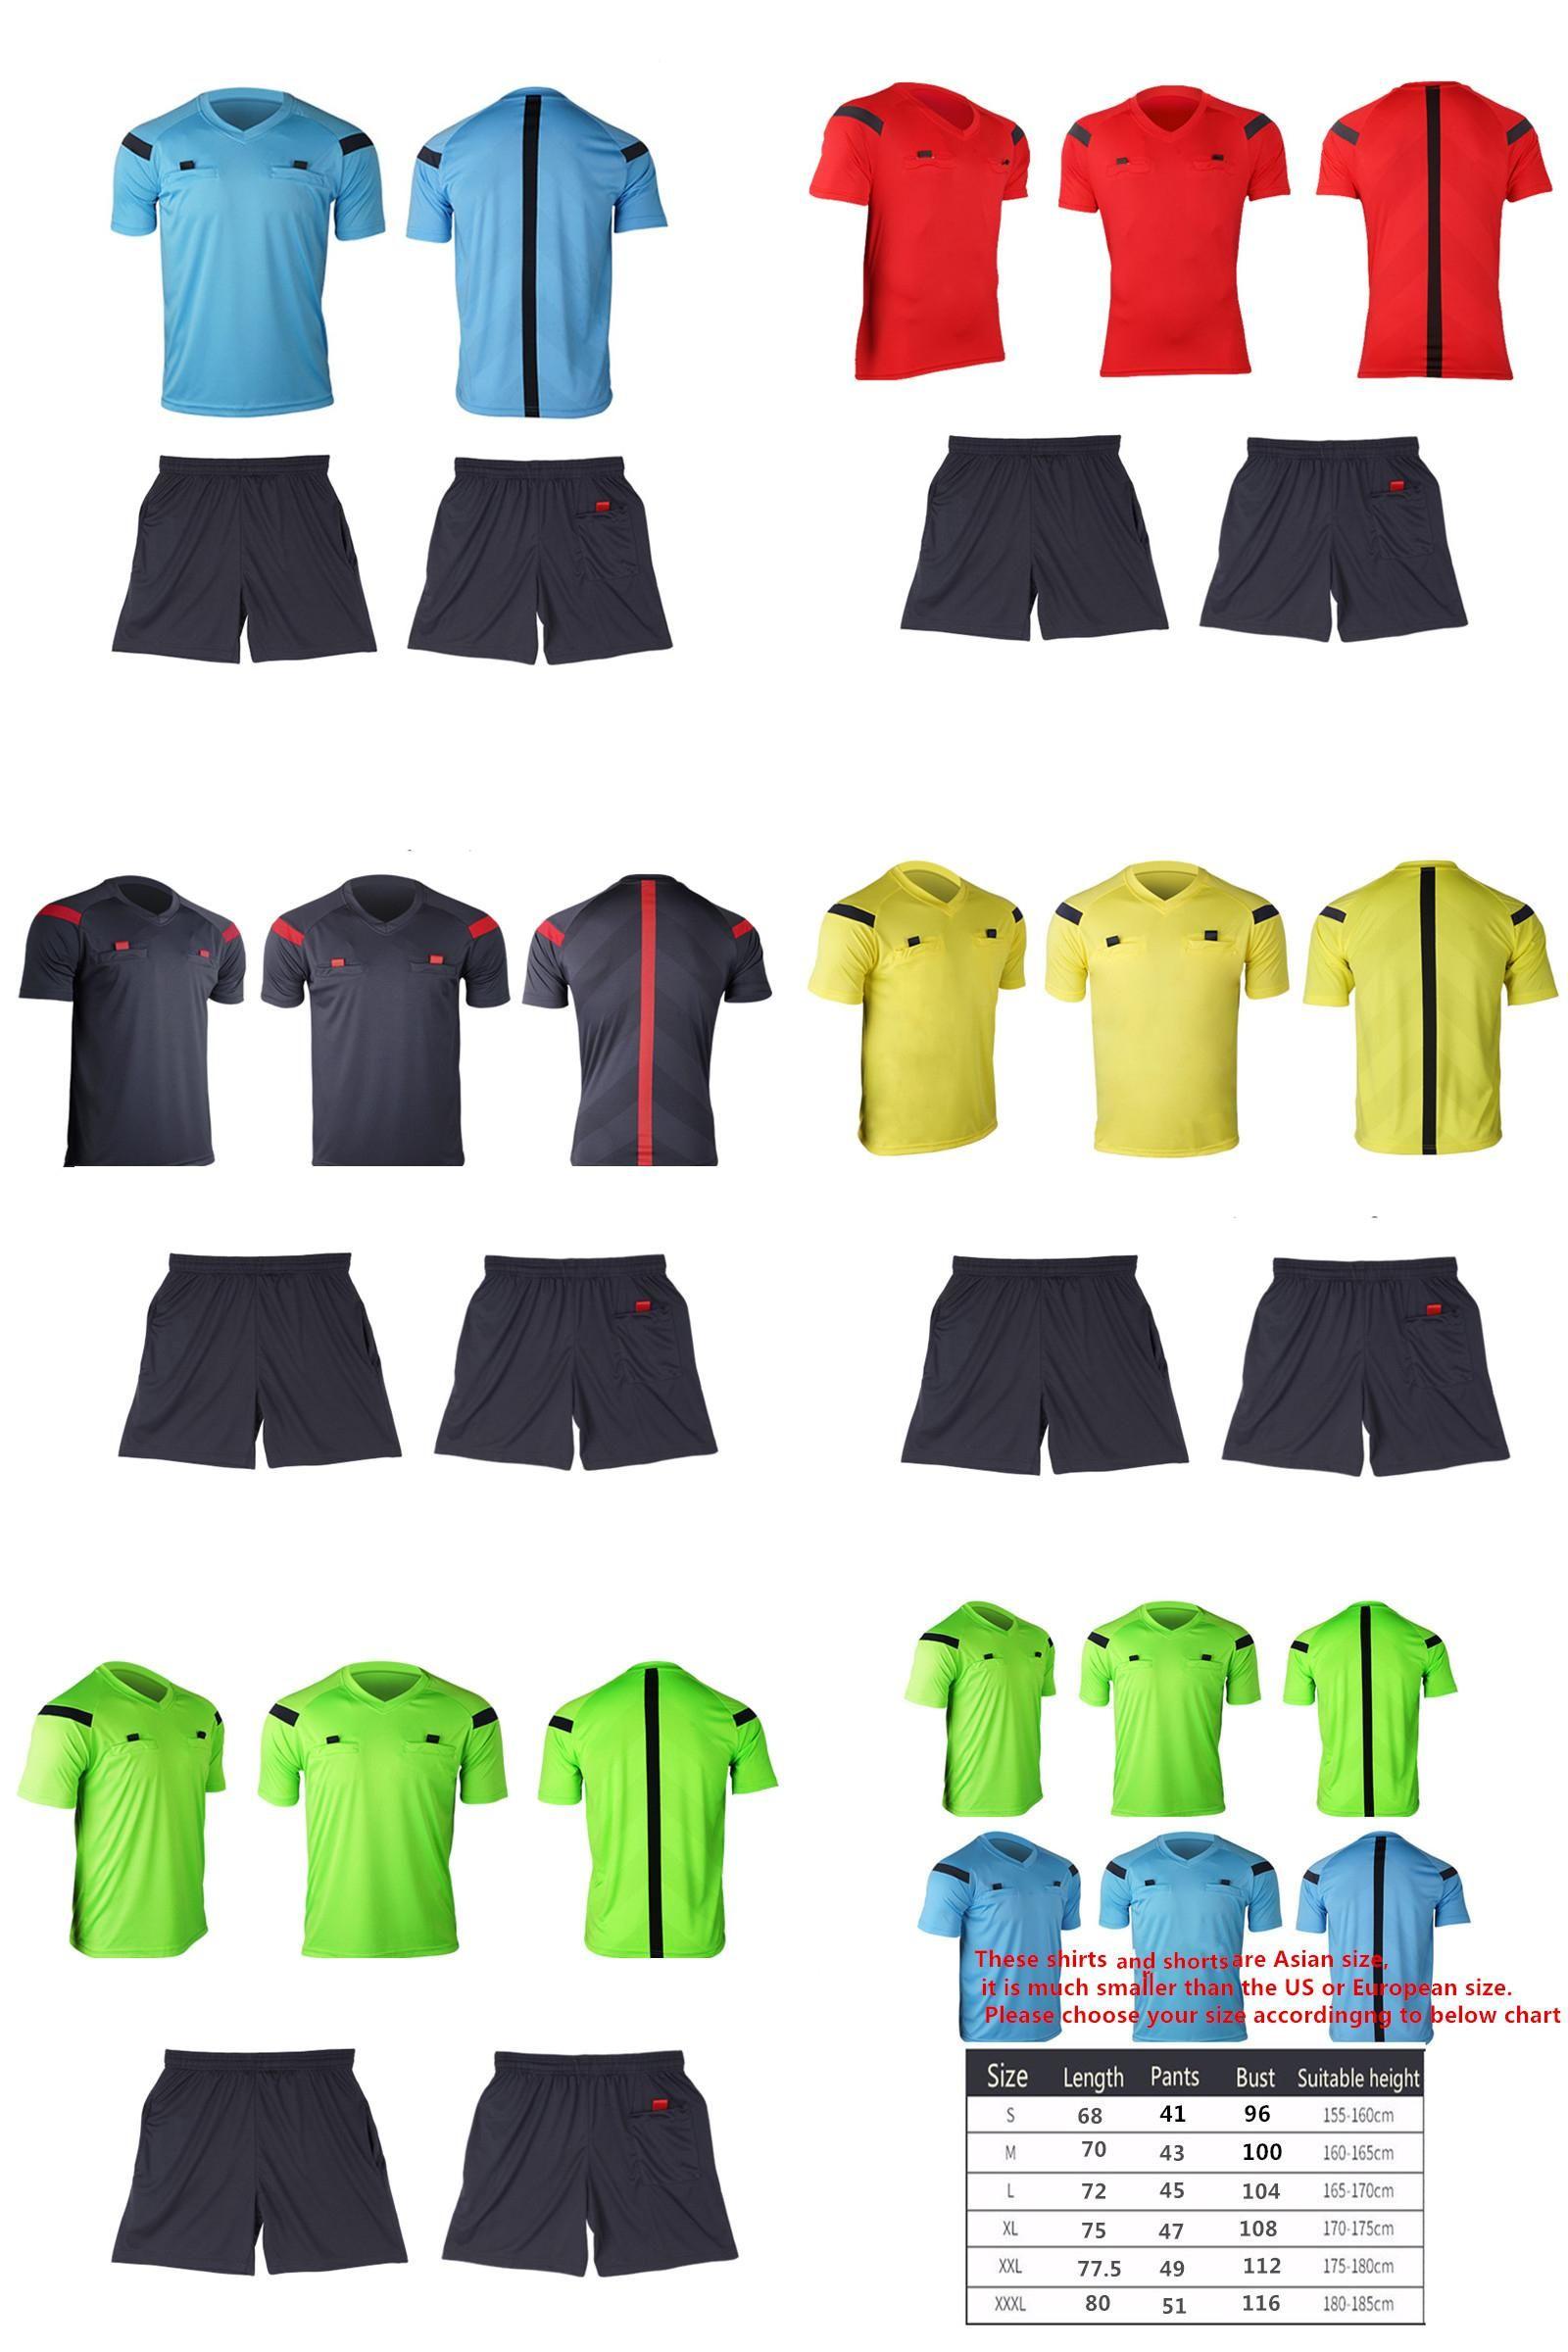 Visit To Buy Referee Jersey Soccer Set 2017 Football Judge Uniform Futbol Shirt Suit Tracksuits Survetement Football Maillot De Foot Advertisement Com Imagens